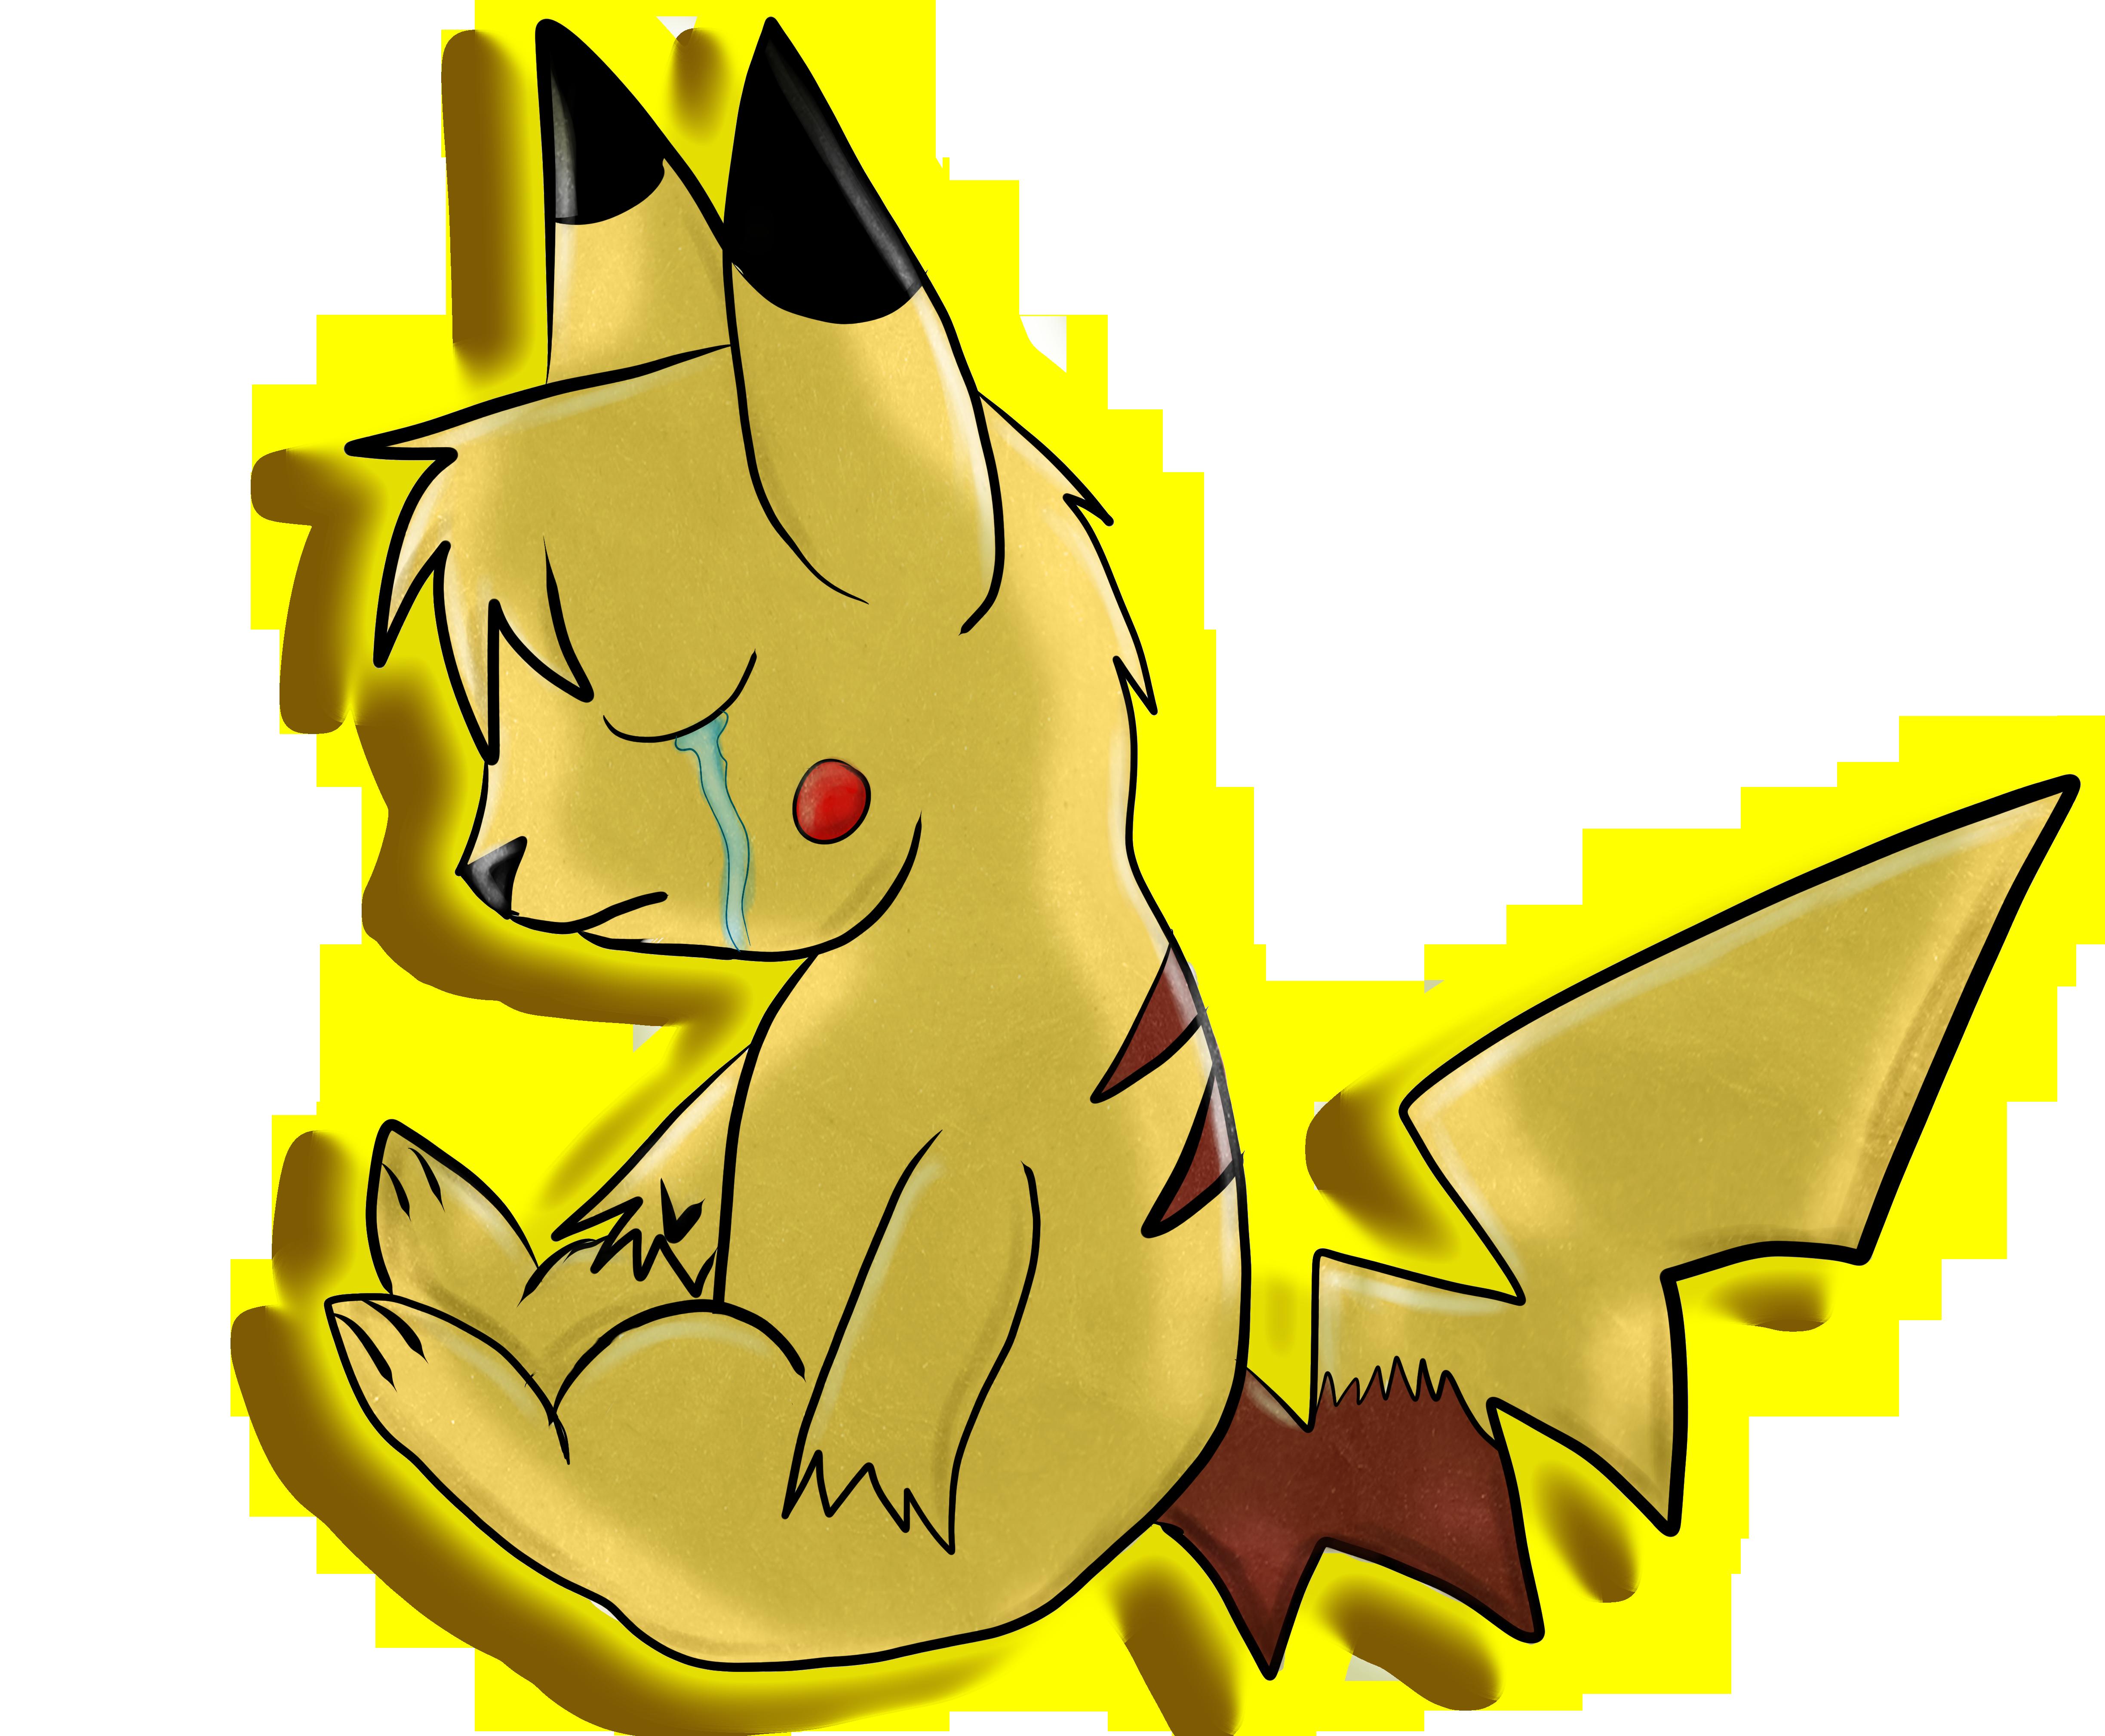 Pikachu crying drawing - photo#21